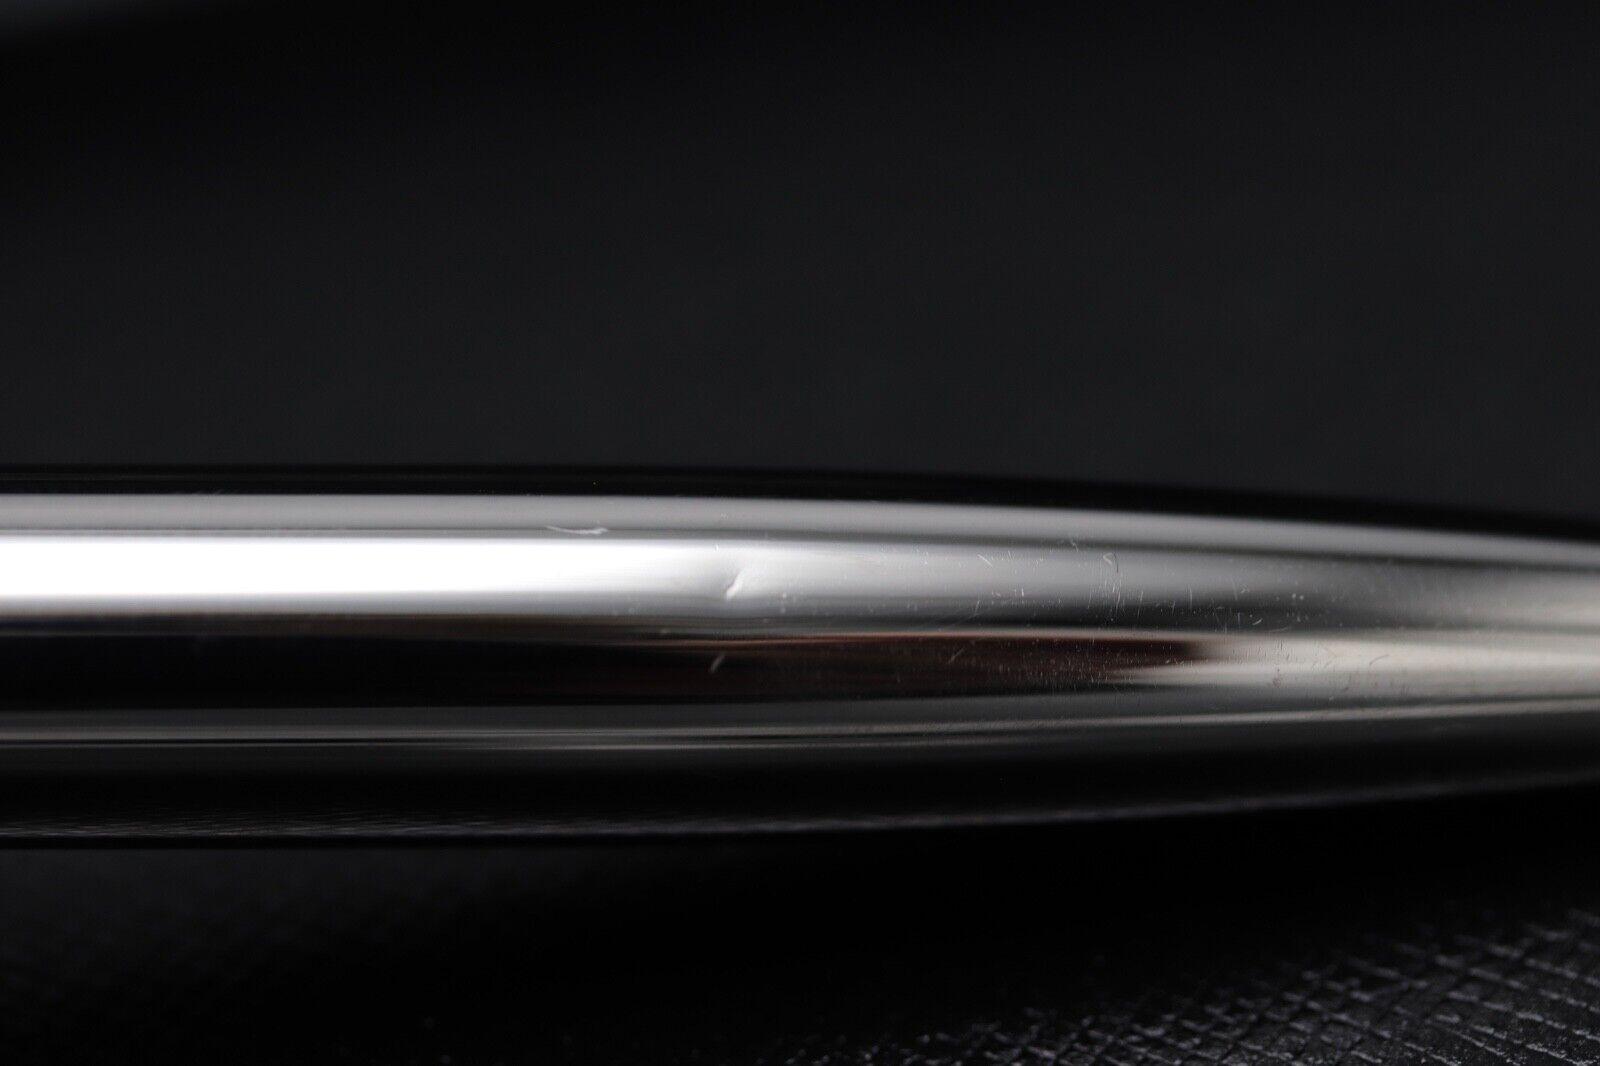 Montblanc Meisterstück Stainless Steel II Classique Ballpoint Pen 7